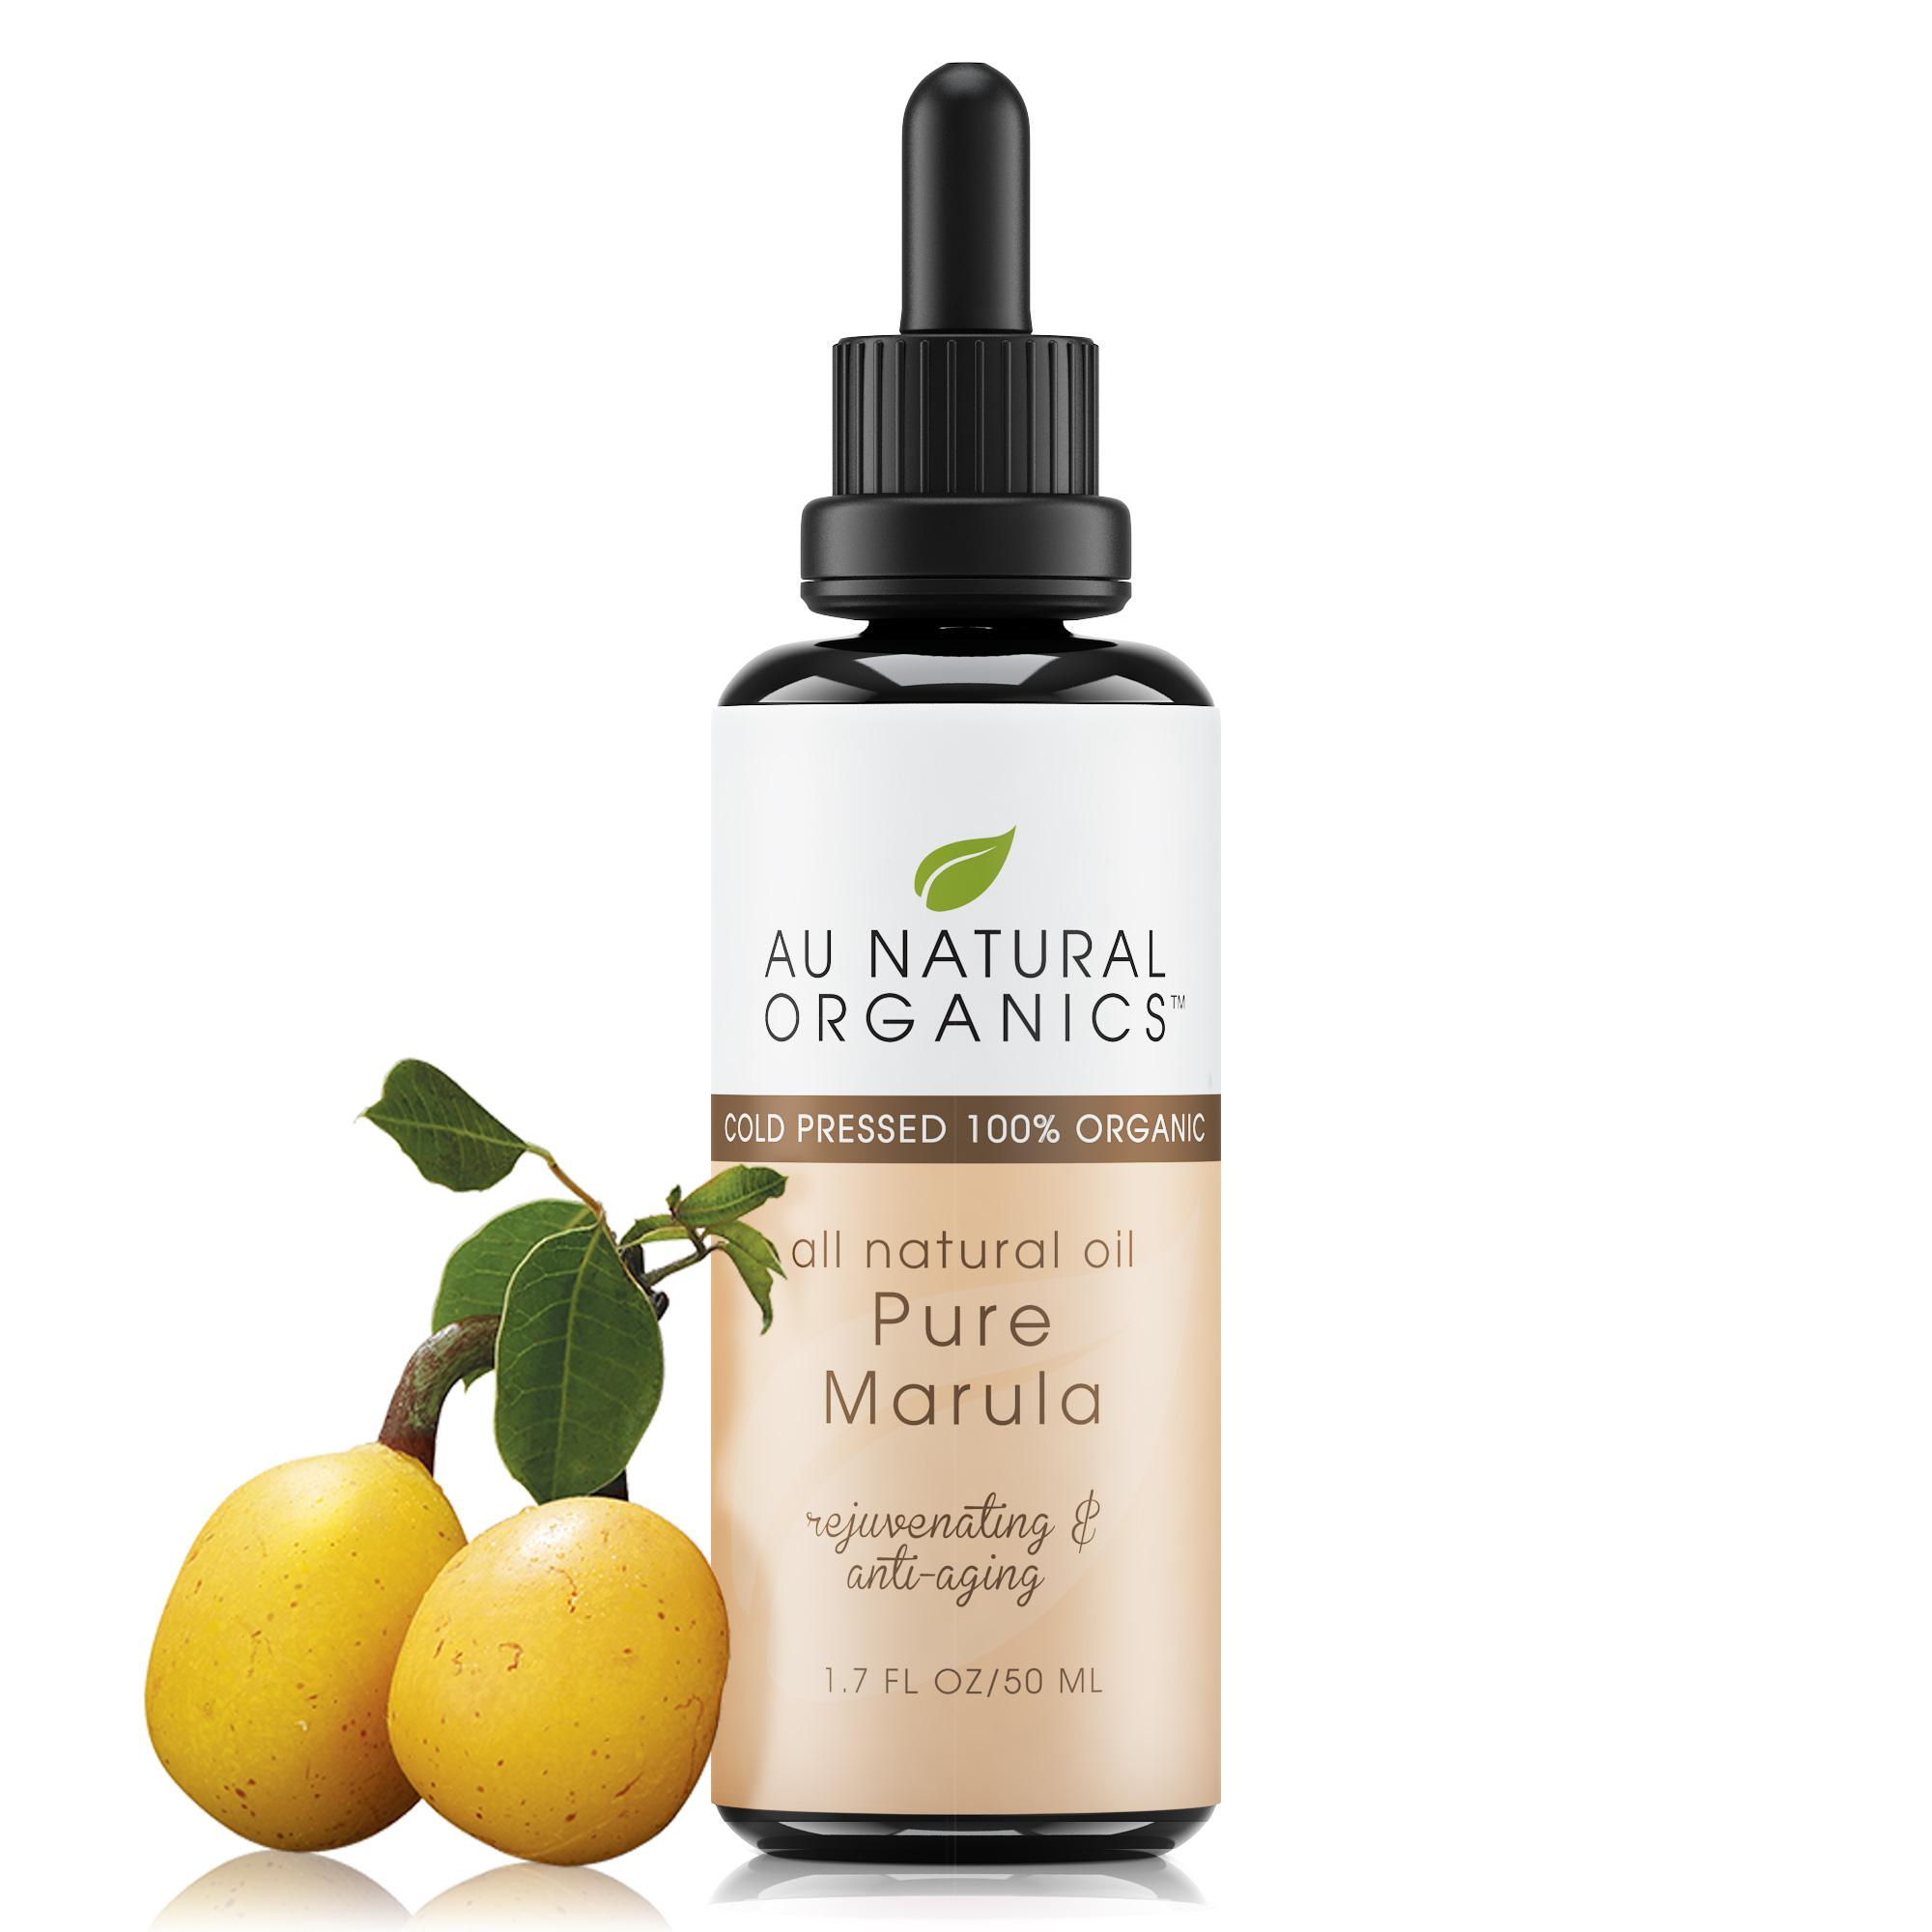 Marula oil